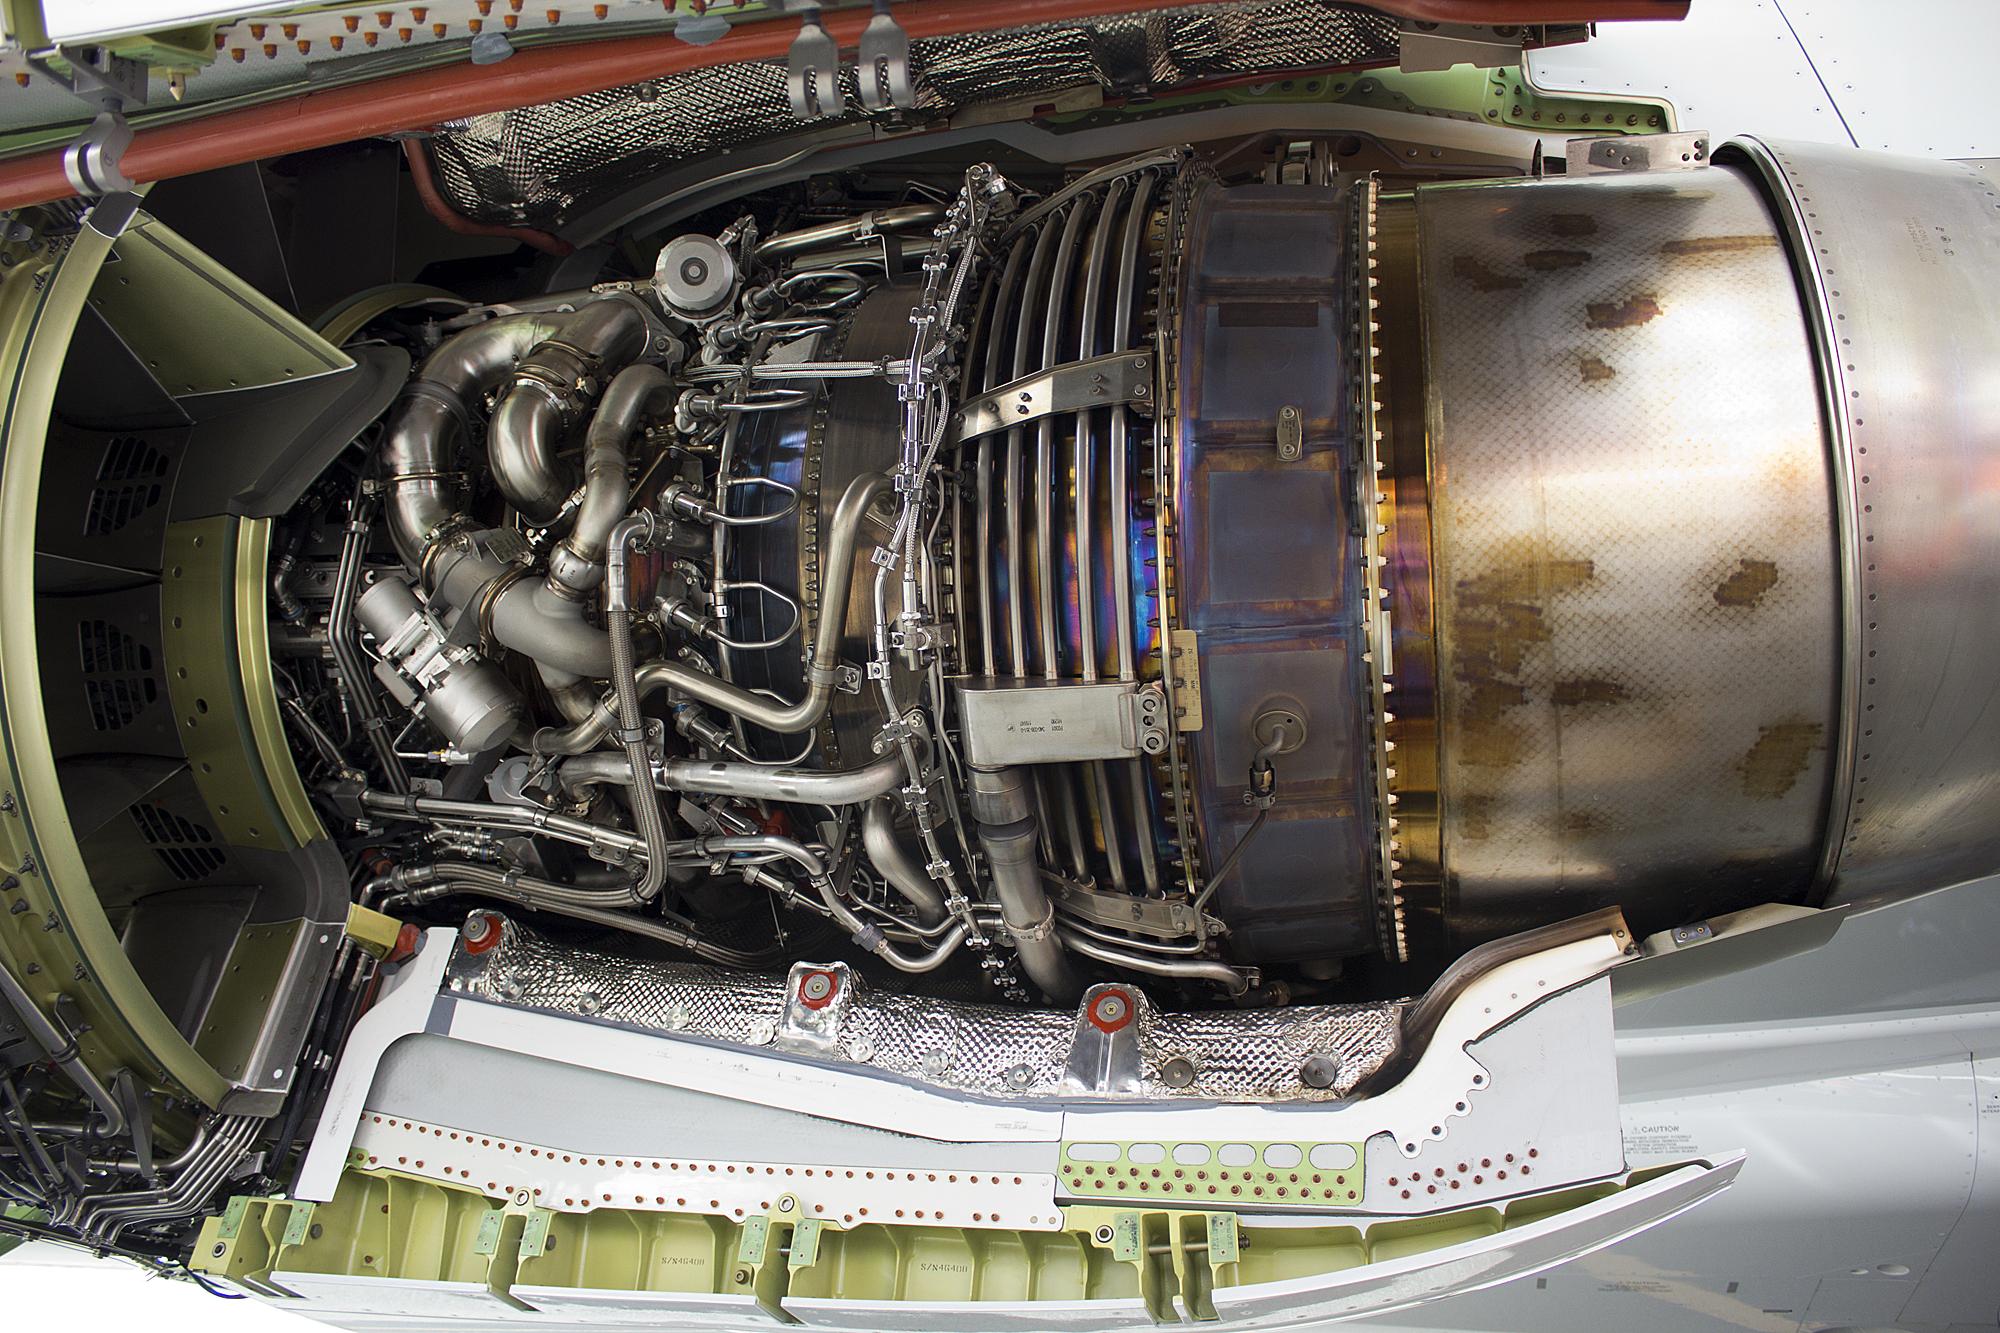 Filecfm International Cfm56 7b26 Fitted To Qantas Vh Vzy Boeing 7 3 Powerstroke Diesel Engine Diagram